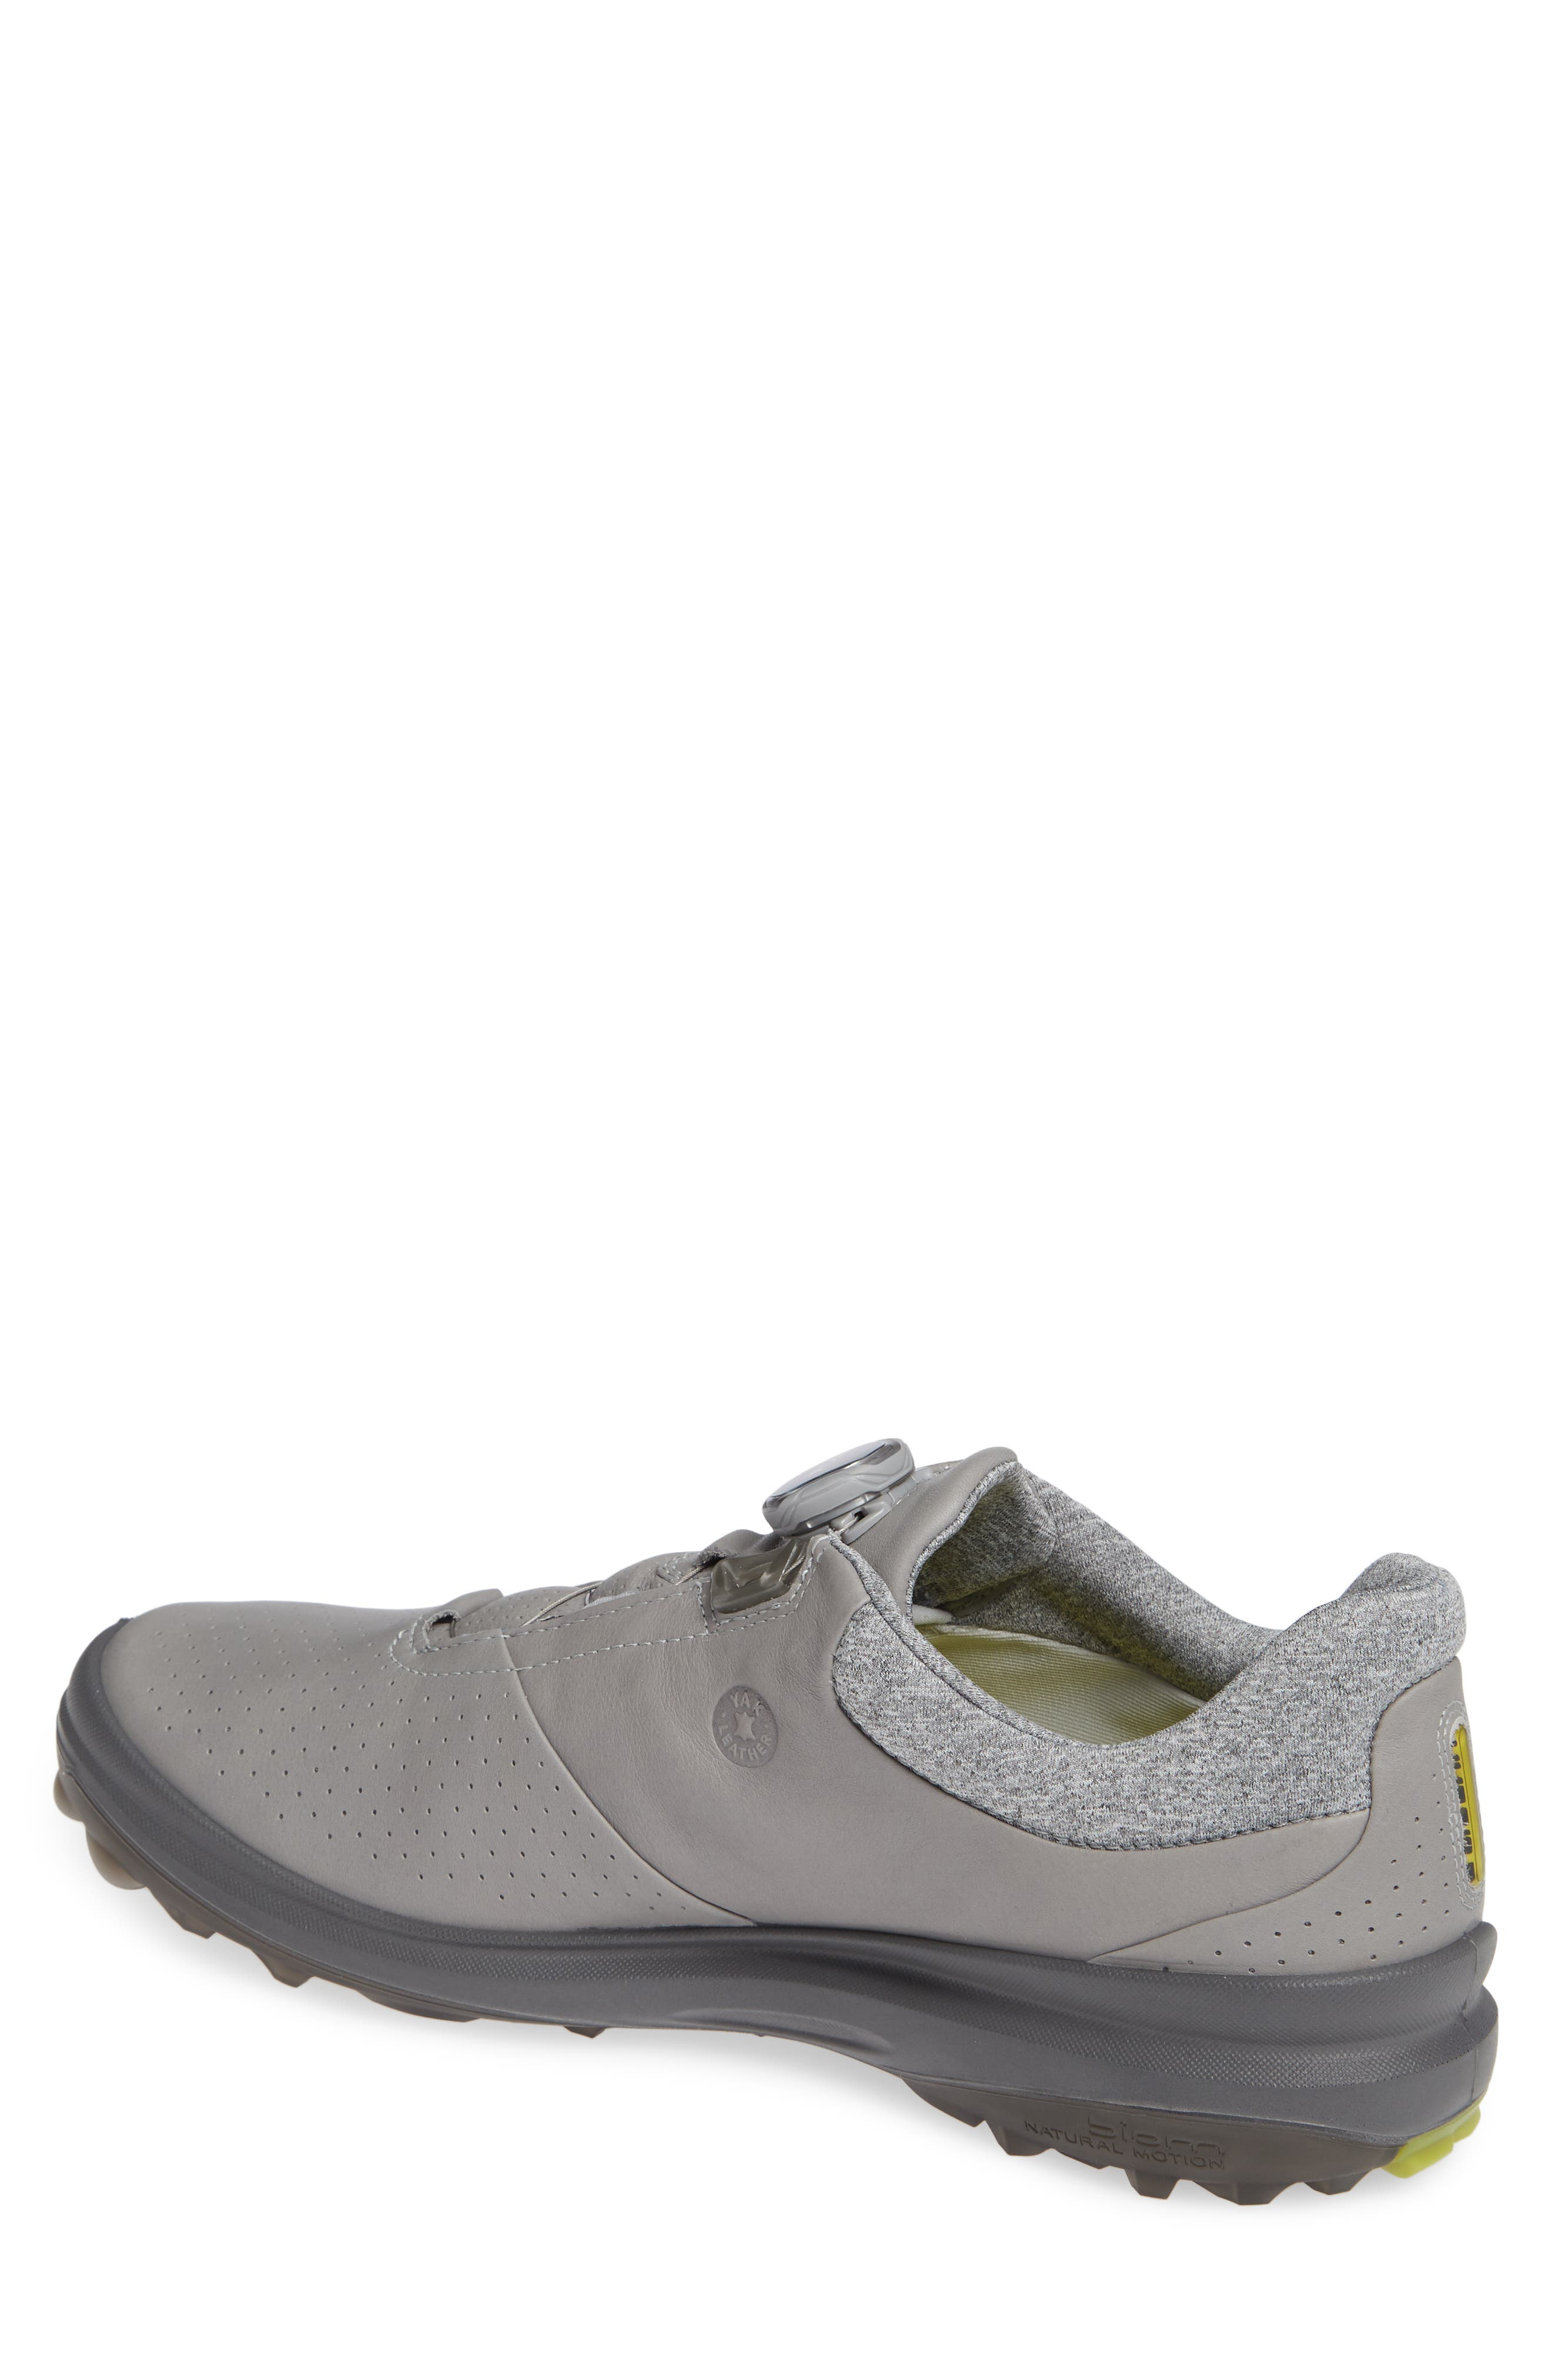 BIOM Hybrid 3 Gore-Tex<sup>®</sup> Golf Shoe,                             Alternate thumbnail 2, color,                             WILD DOVE/ KIWI LEATHER